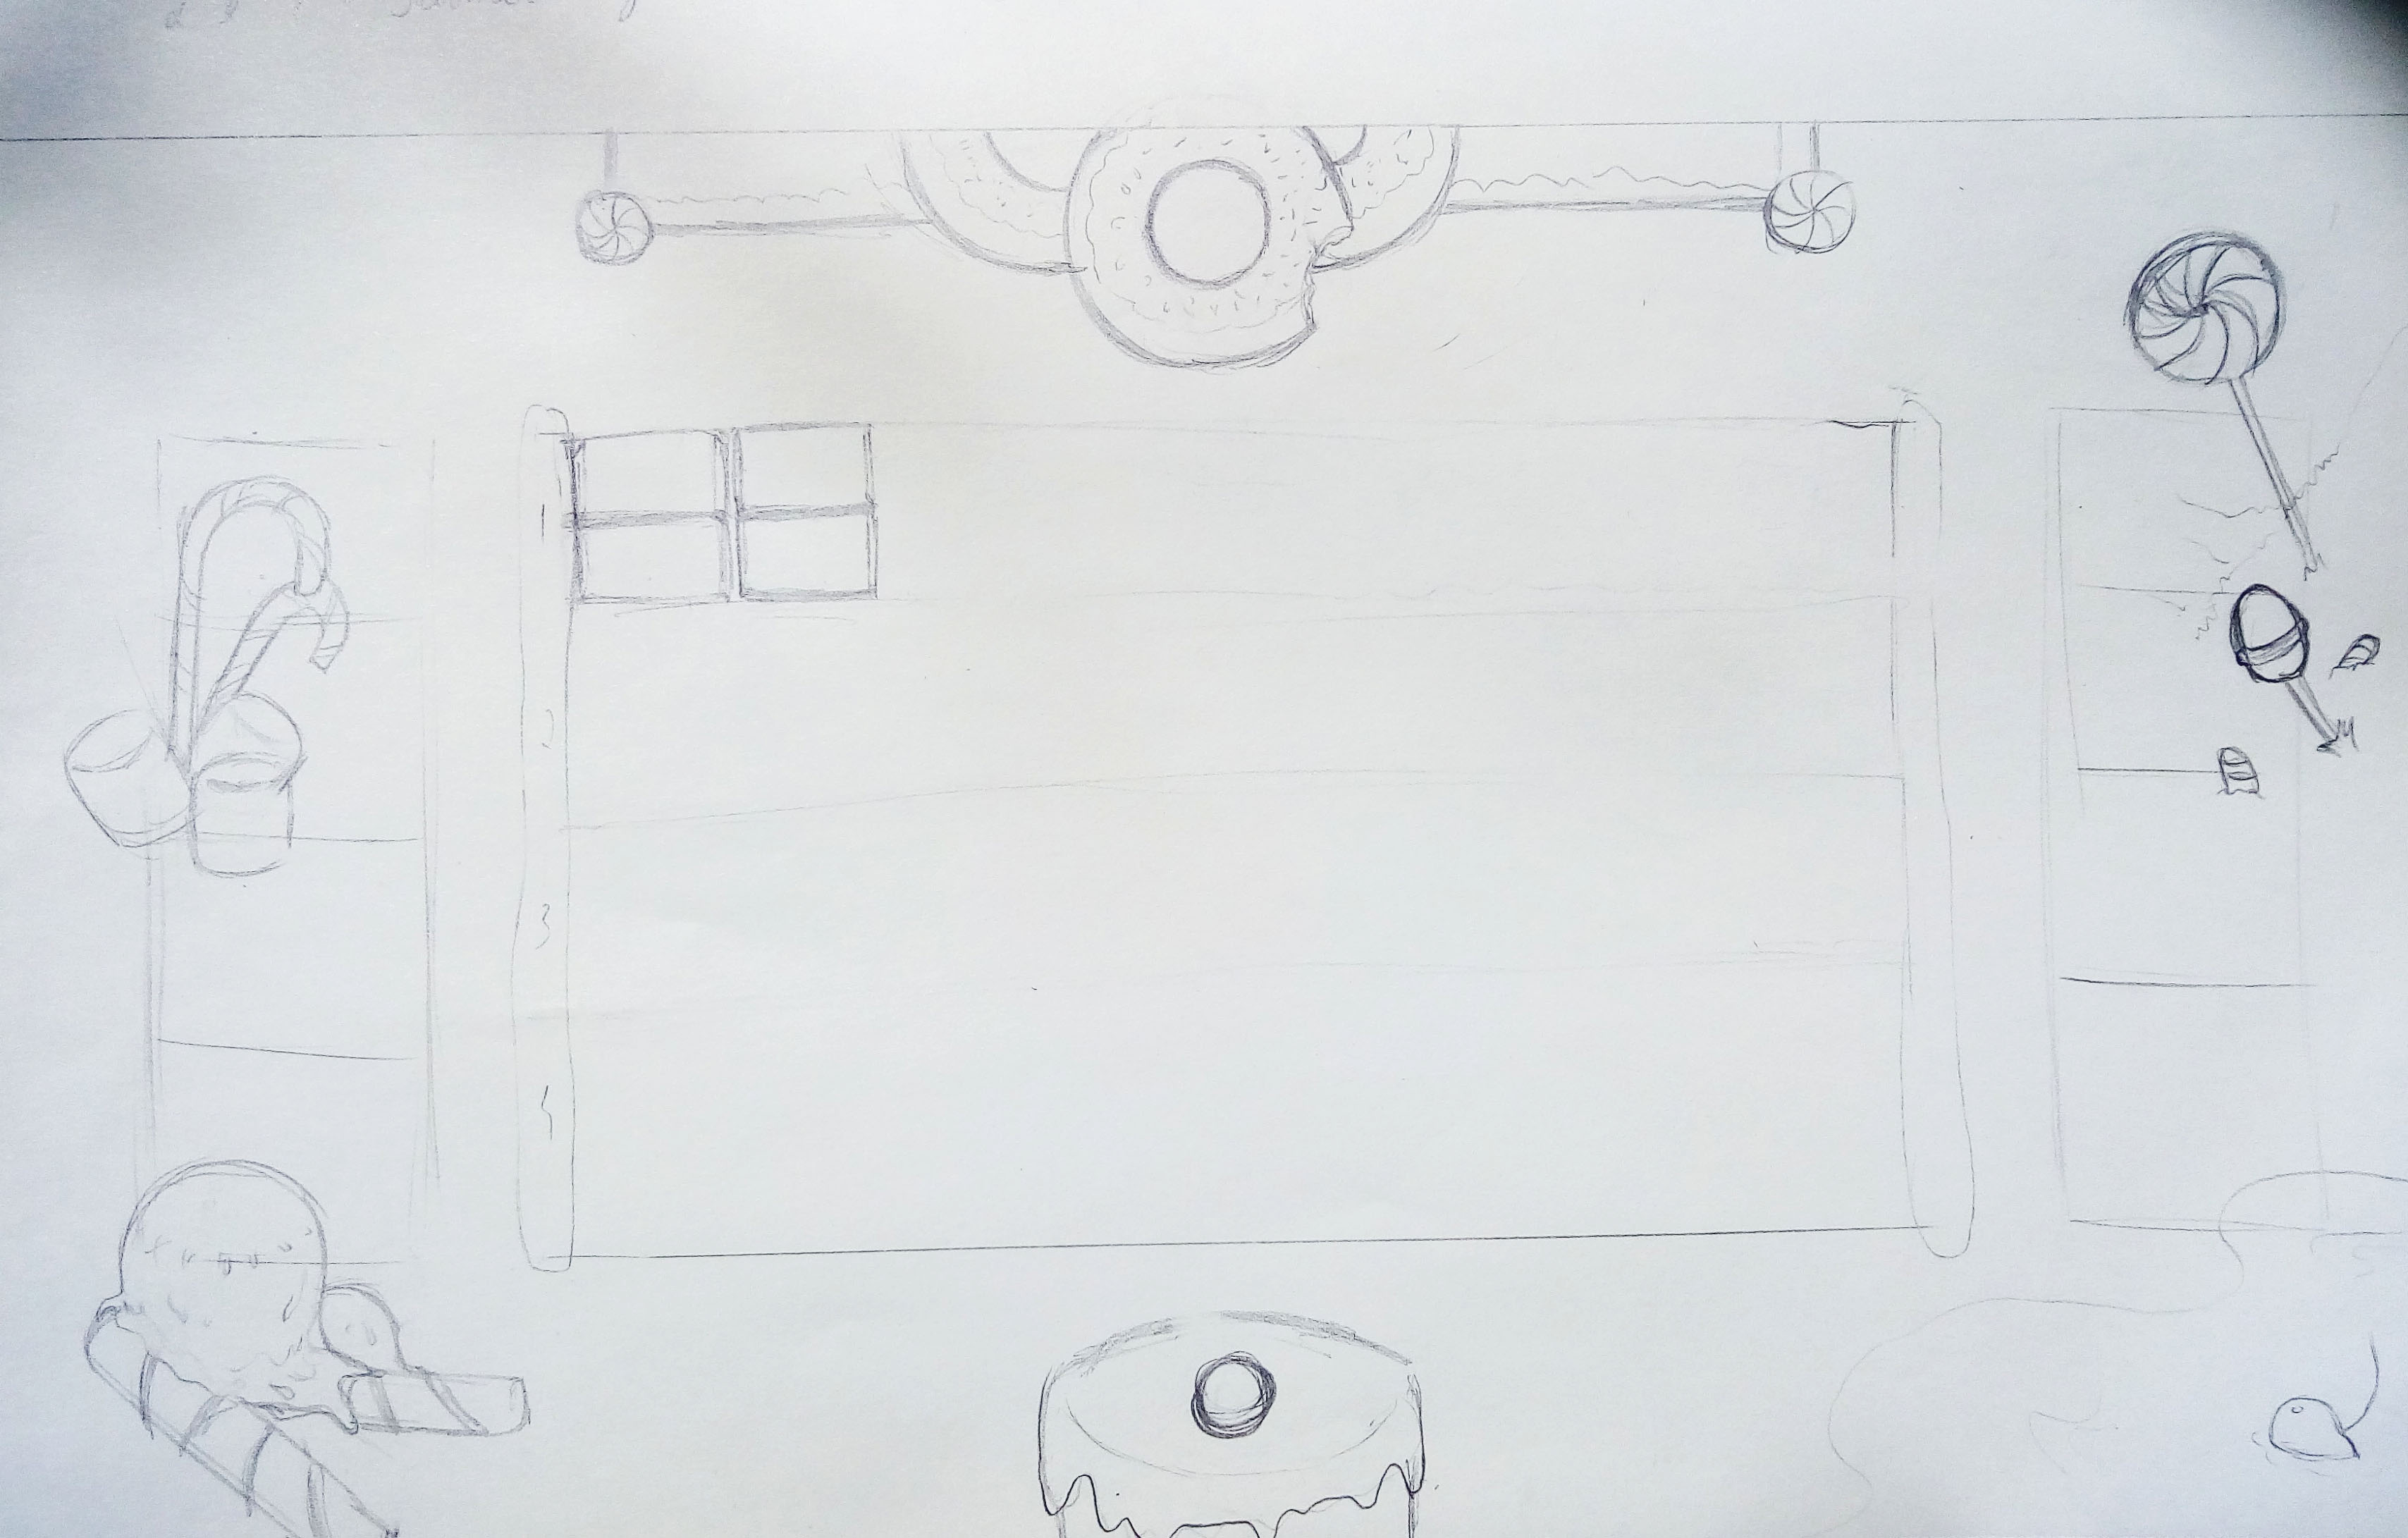 Game Board Environment Sketch 2